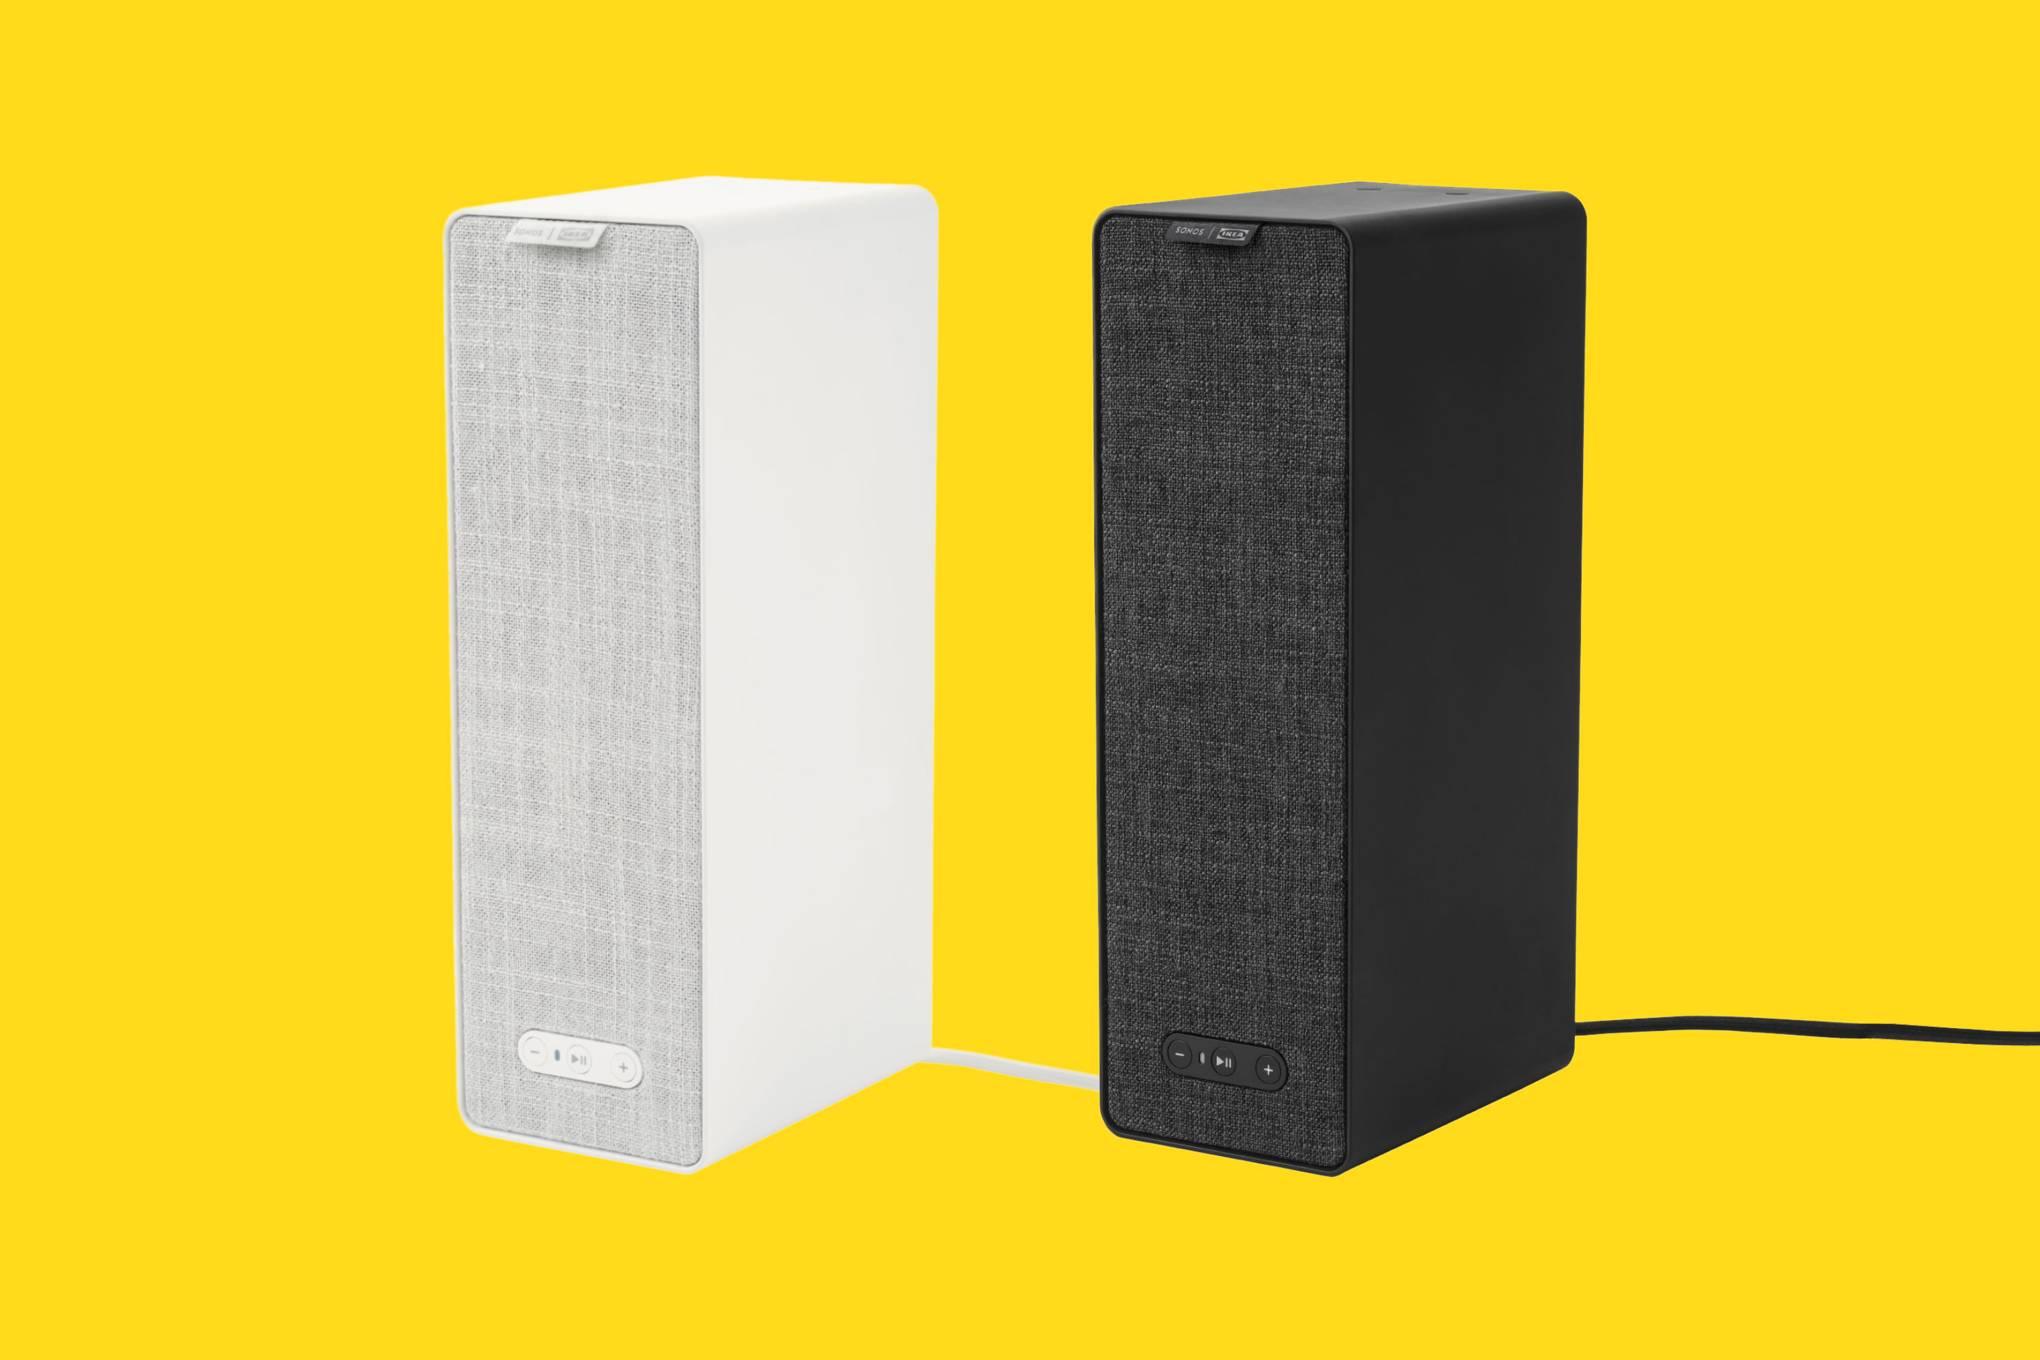 IKEA Symfonisk review: Sonos in cheaper, more versatile